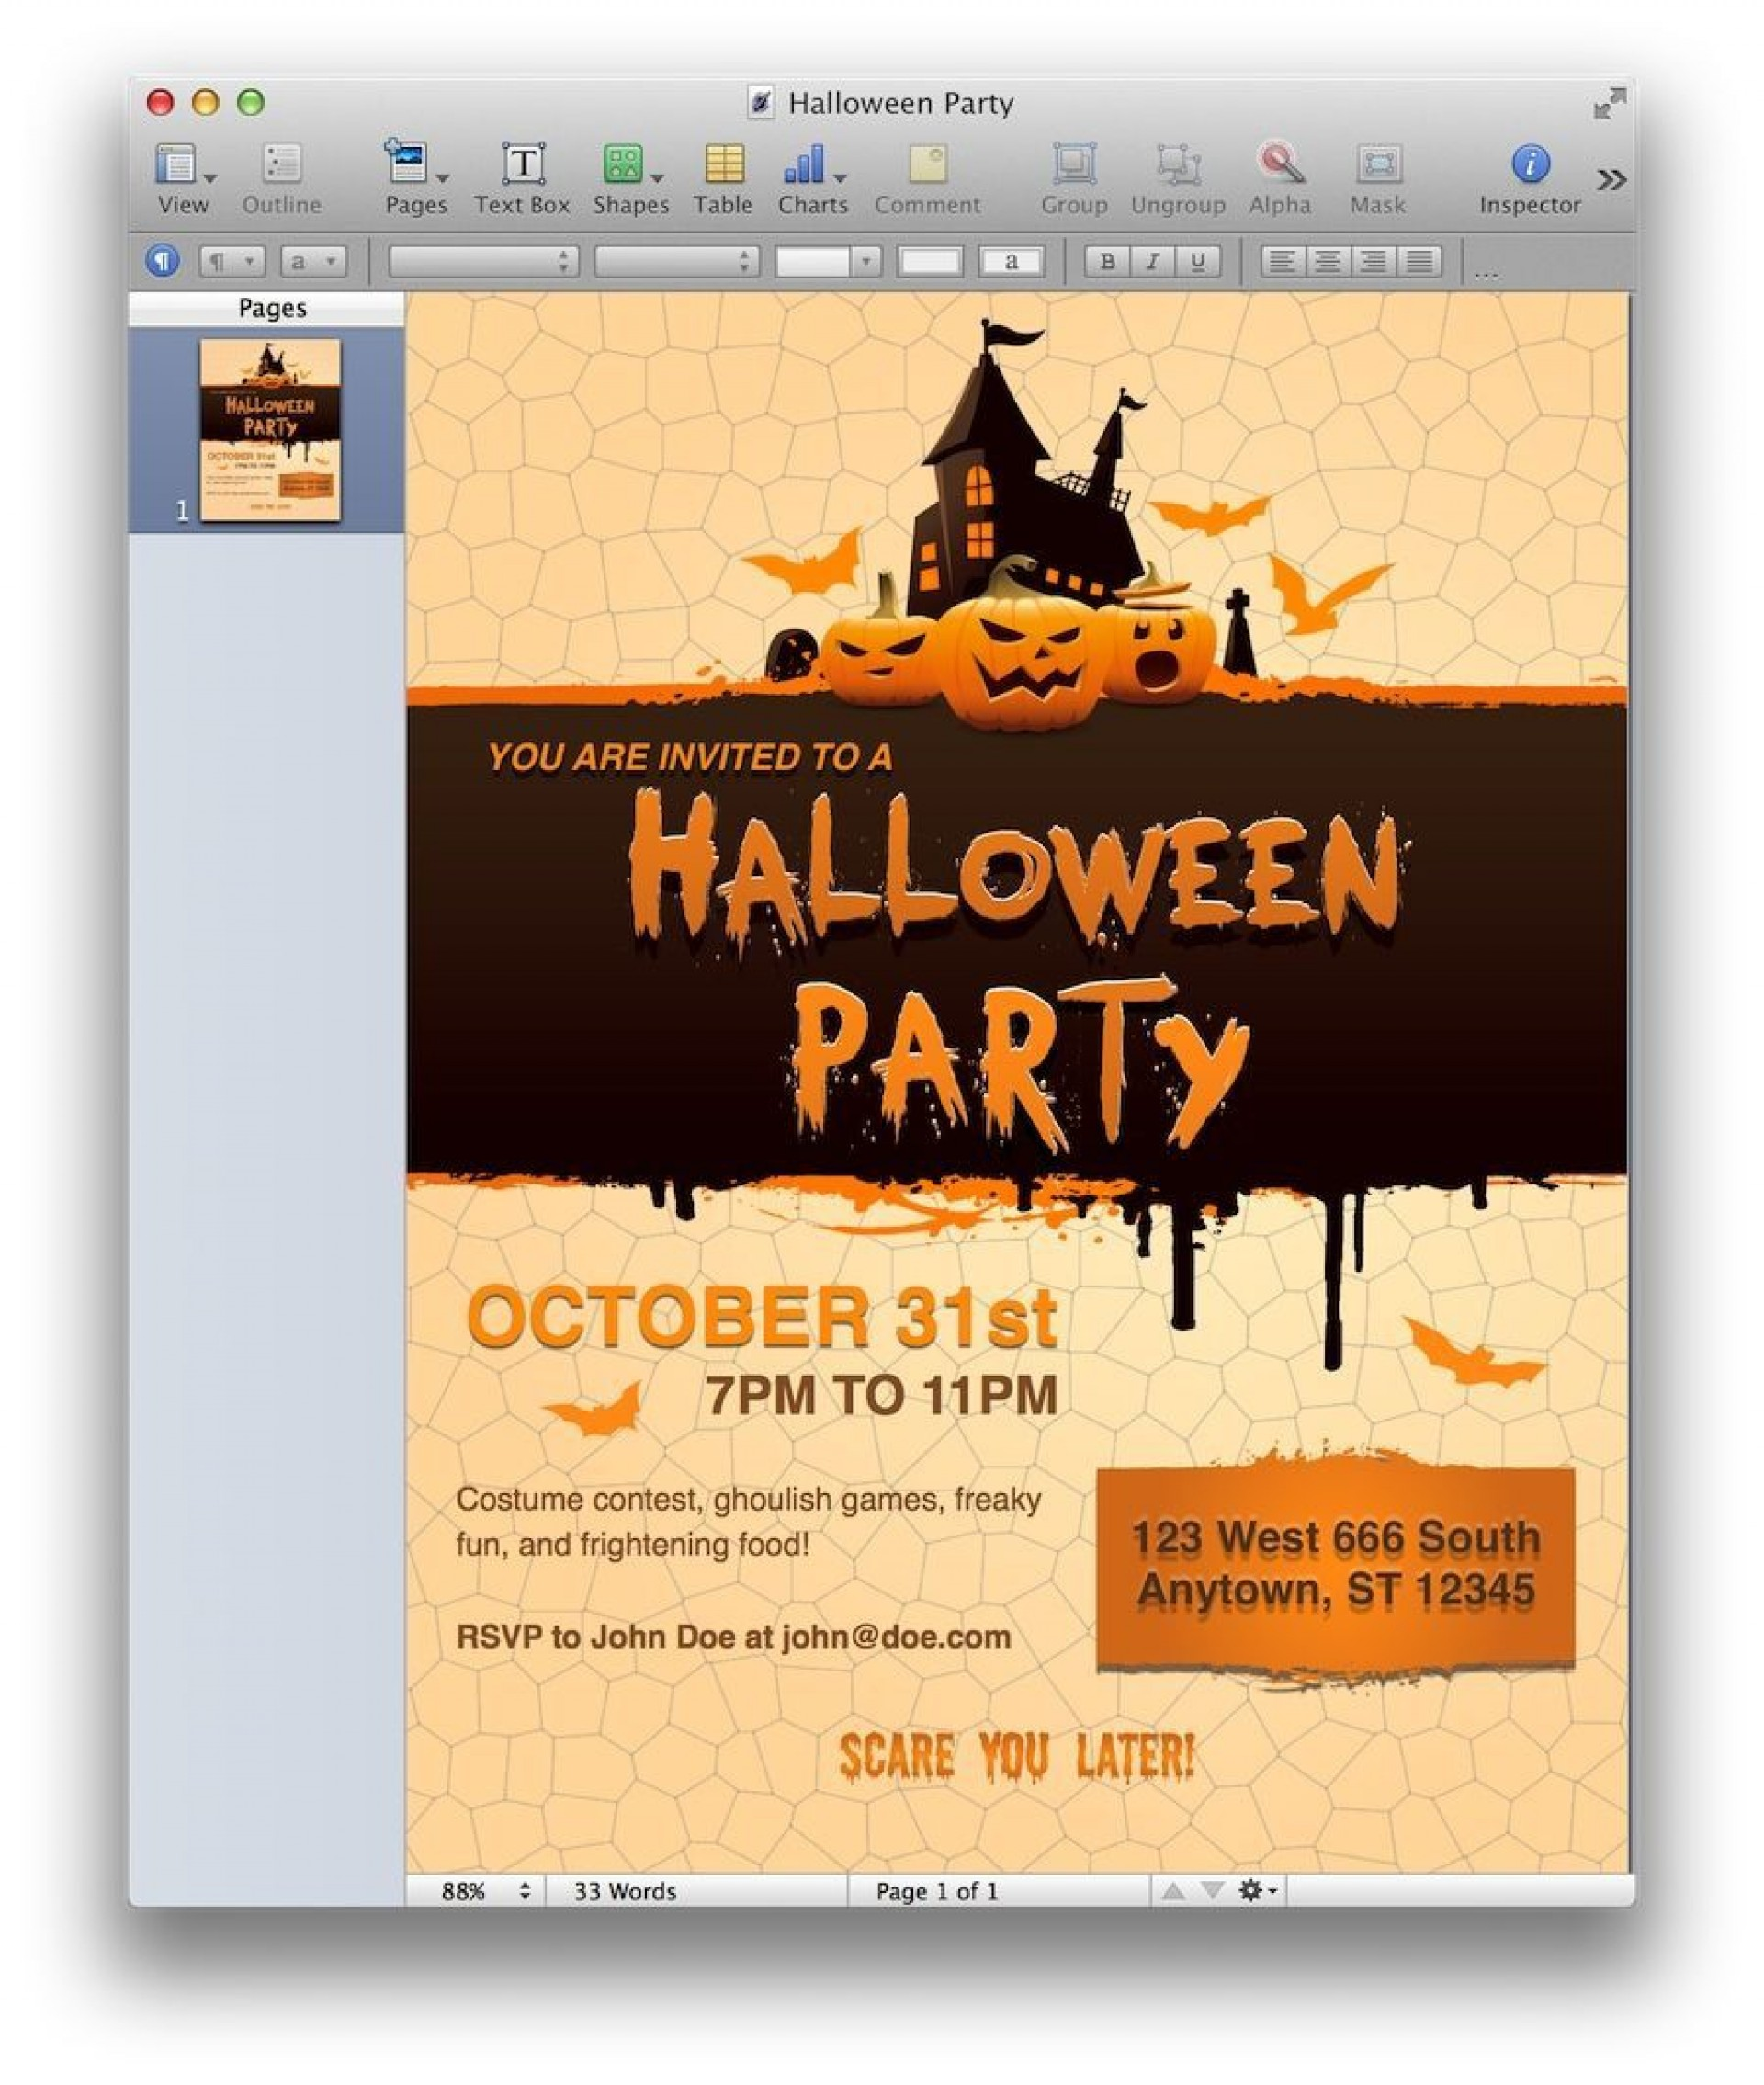 001 Fascinating Halloween Party Invite Template Design  Templates - Free Printable Spooky Invitation Birthday1920